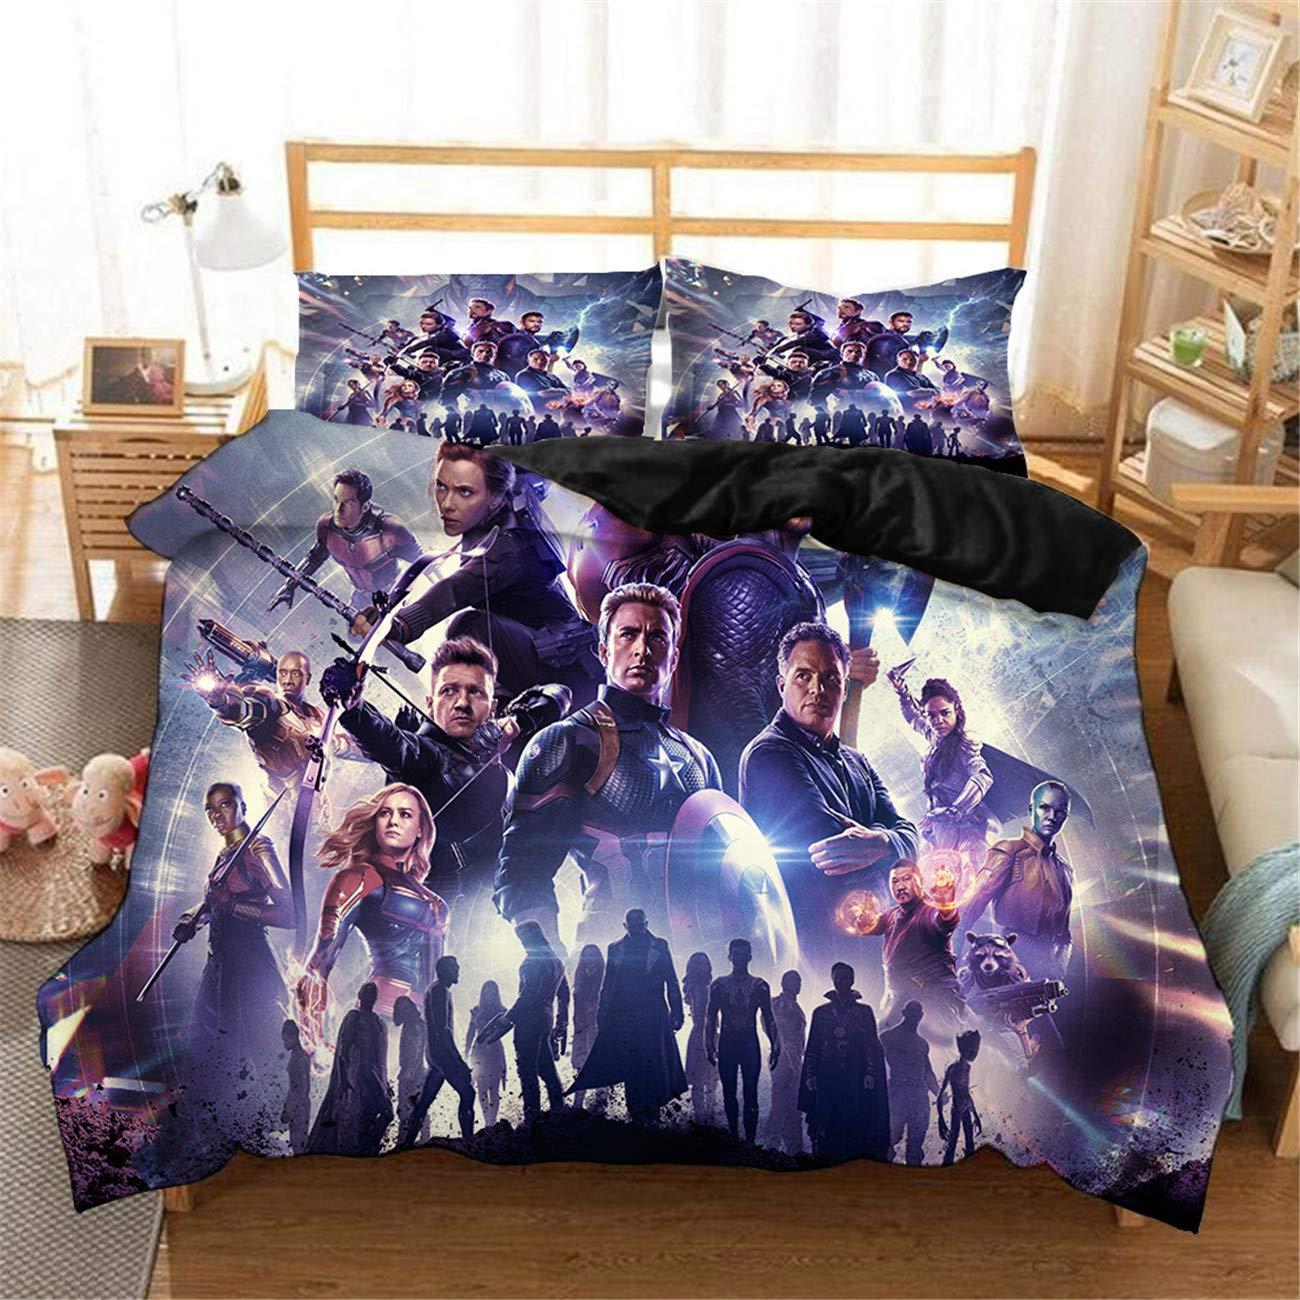 Zi Teng 3d Avengers Movie Duvet Cover Set 2019 Most Popular Movie Marvel Avengers Bedding Set Children Adult Favorite 100 Microfiber Bed Set Twin Full Queen King Size Buy Online In Solomon